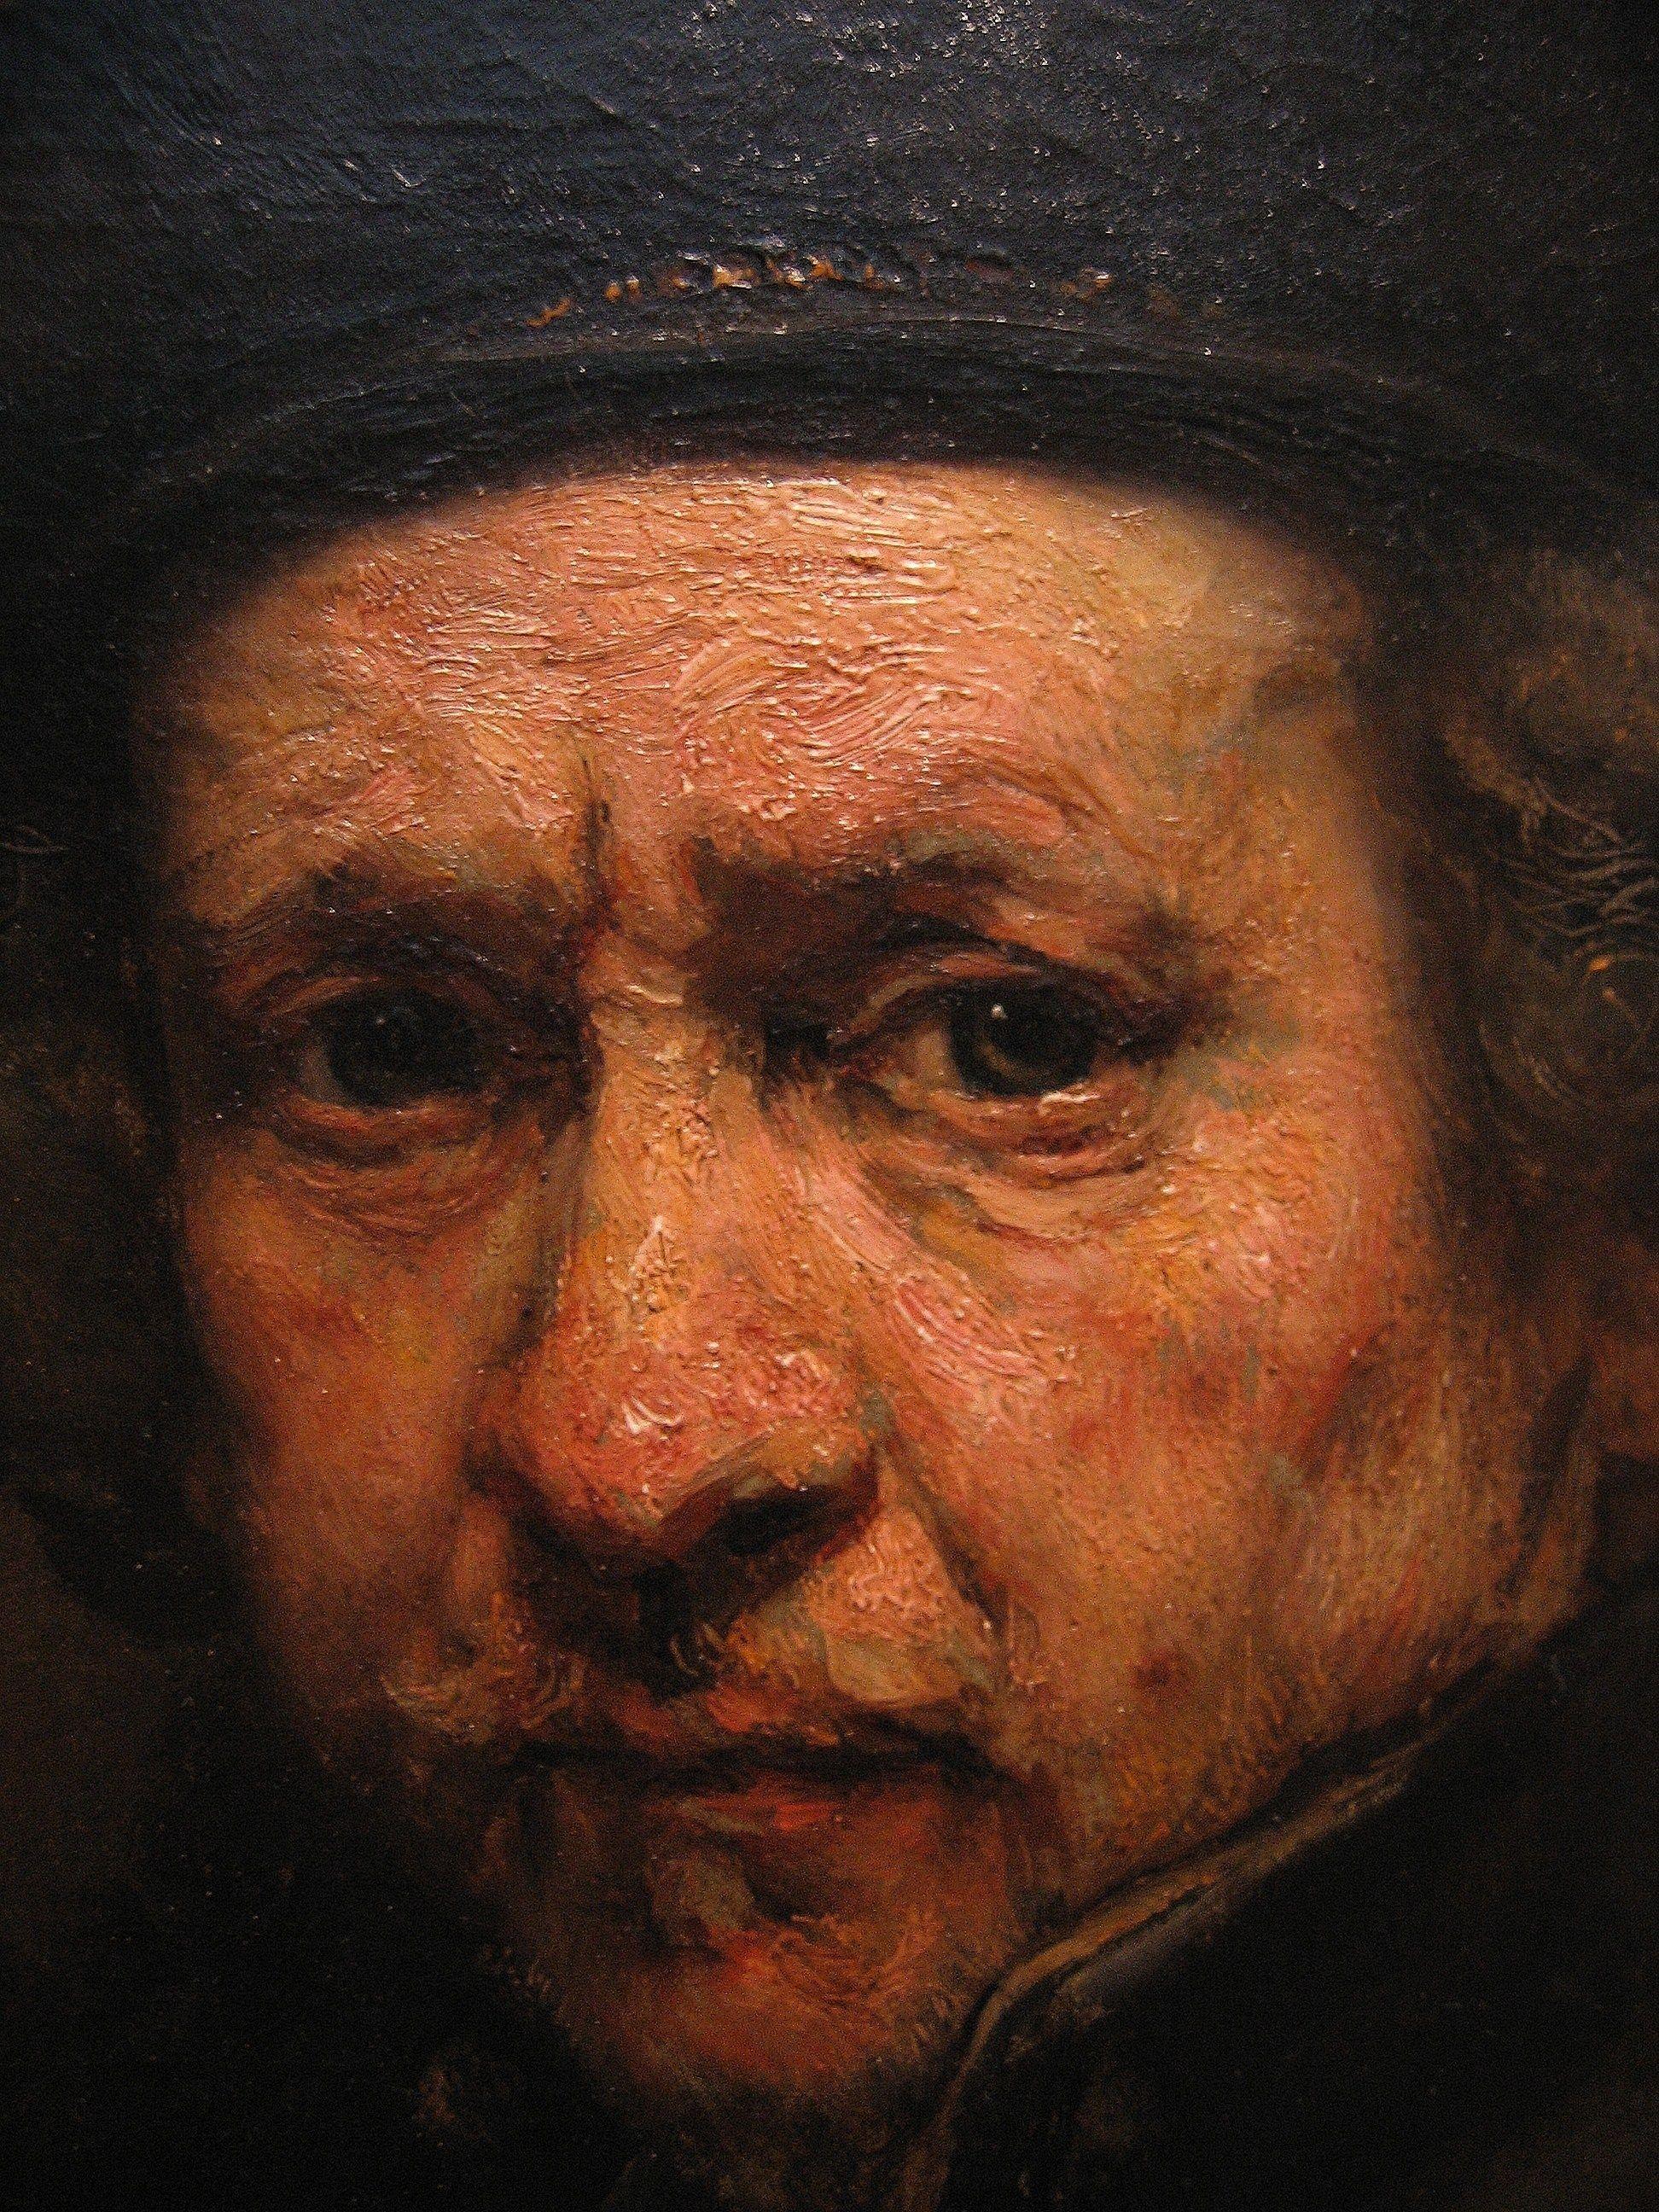 File:Rembrandt van Rijn - Self-Portrait (1659) detail.jpg